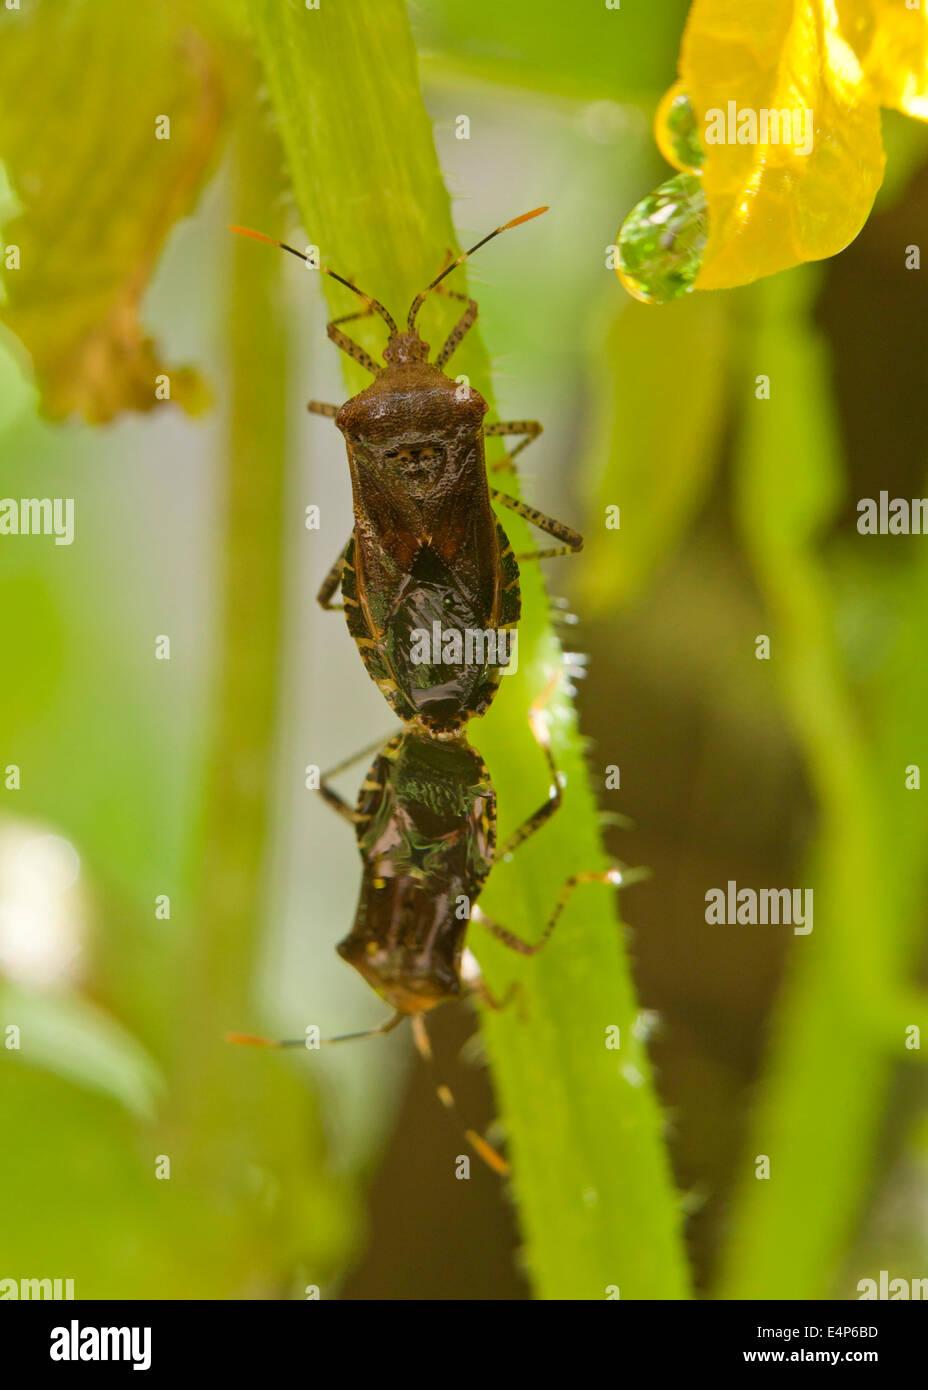 Squash bugs mating (Anasa tristis) - Virginia, USA - Stock Image